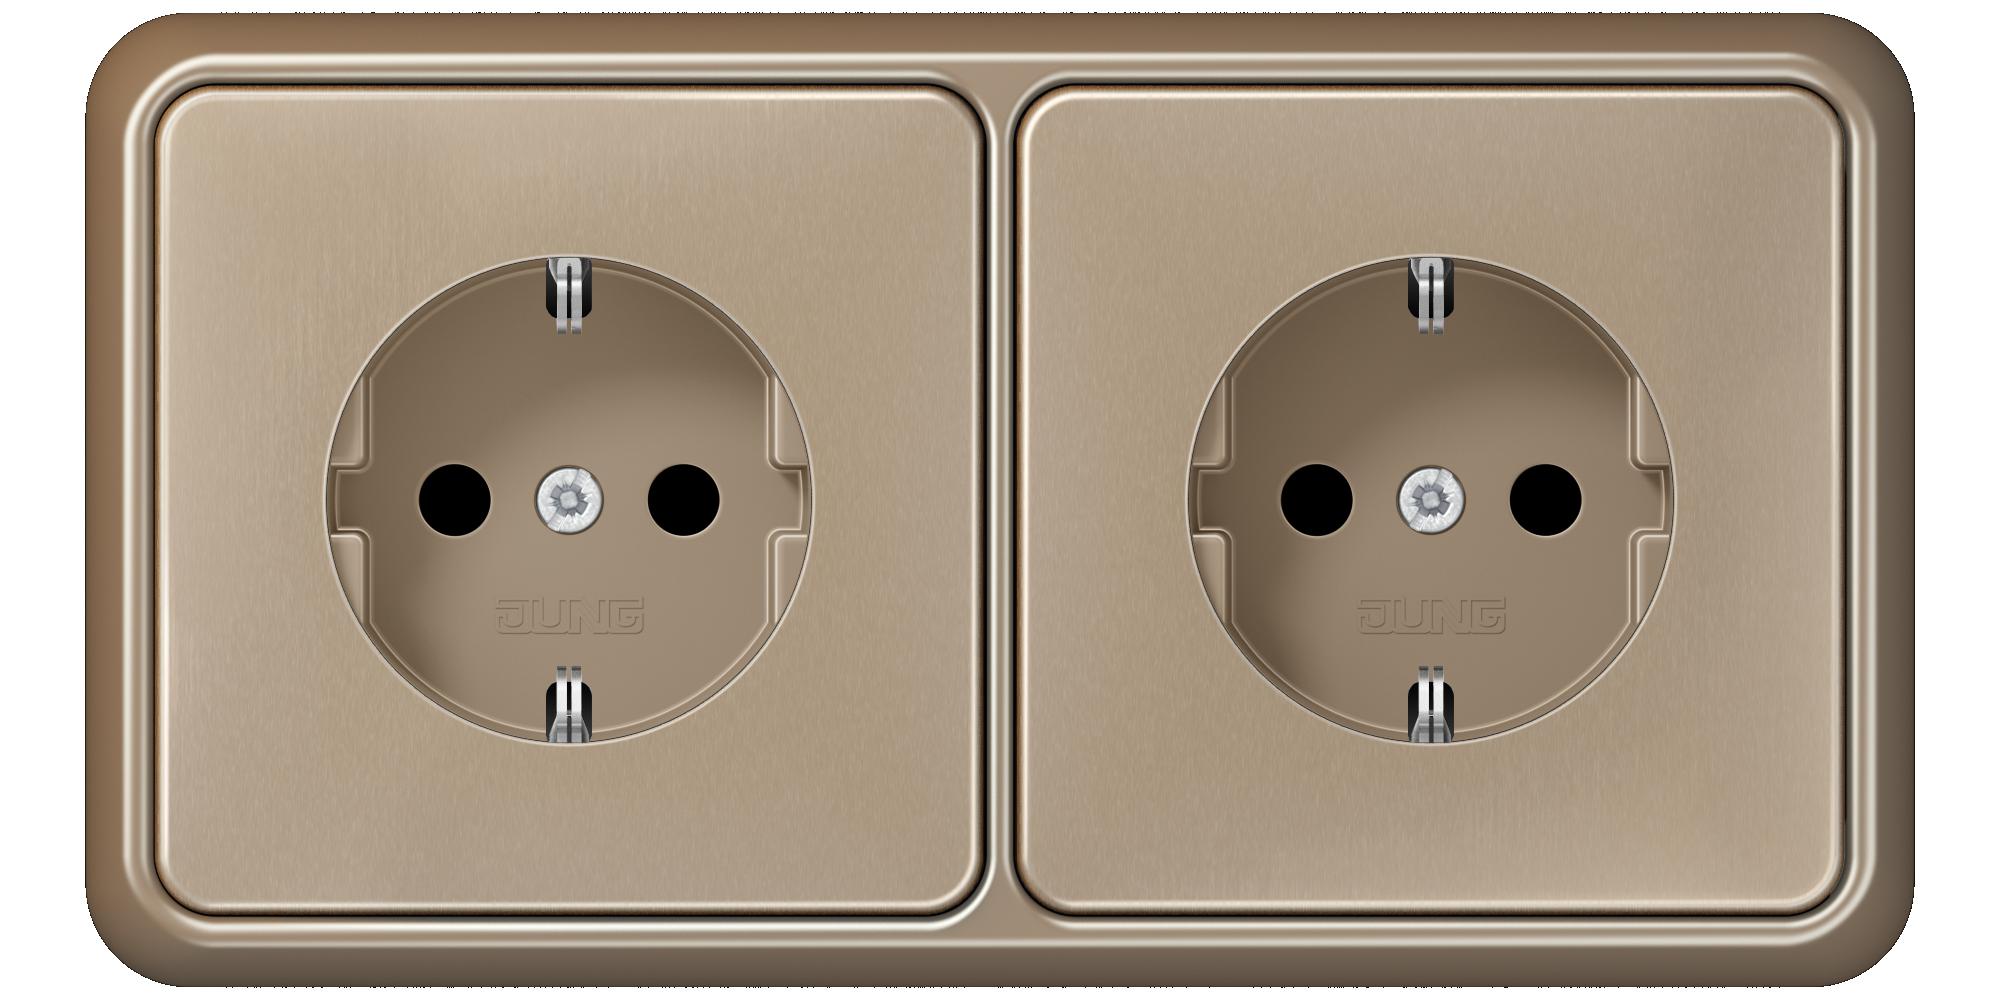 JUNG_CD500_gold-bronze_socket-socket_H